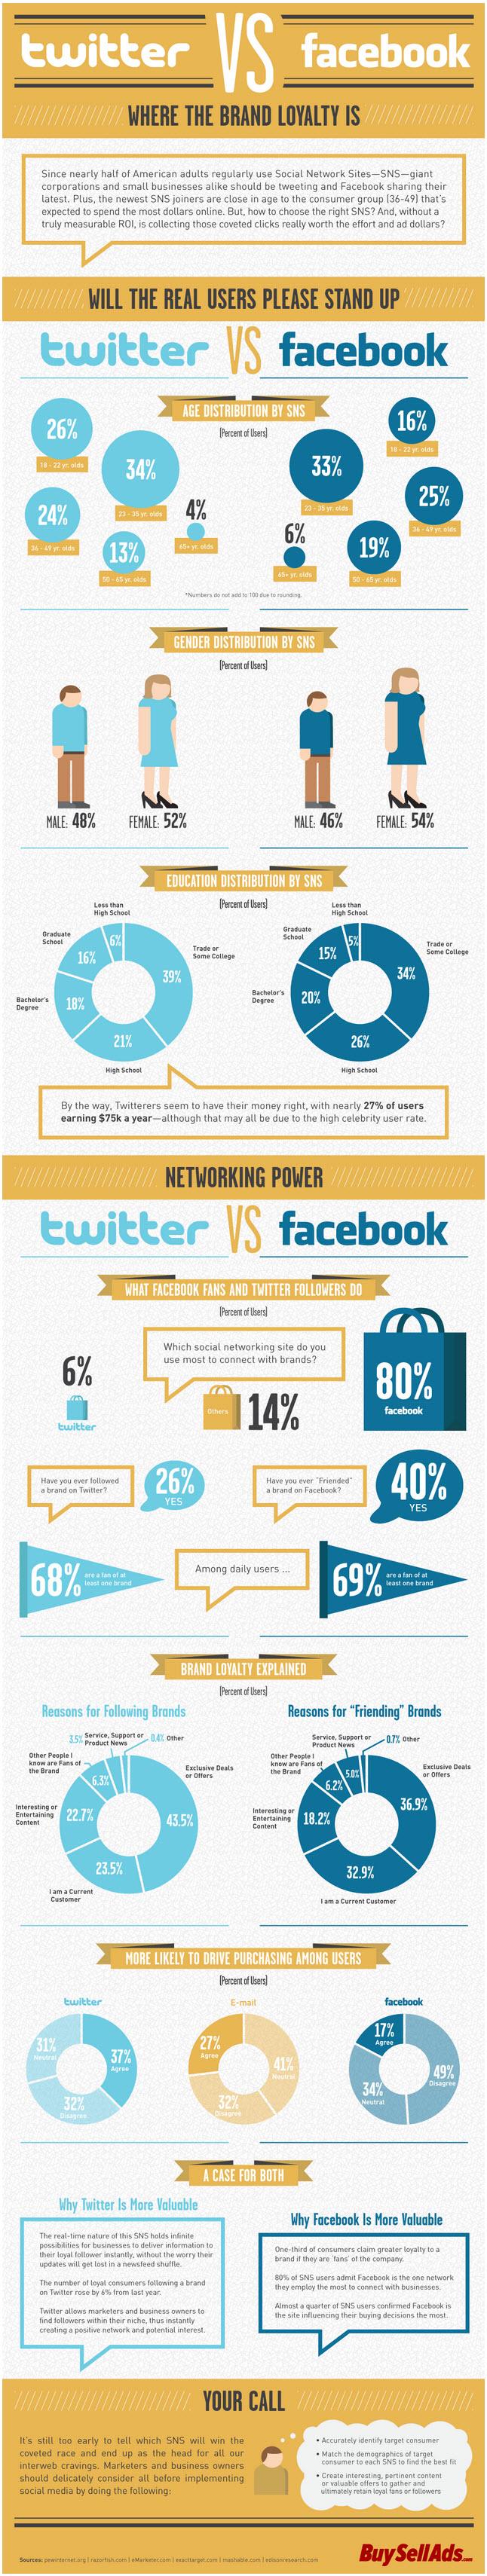 Twitter-vs-Facebook-Infographic